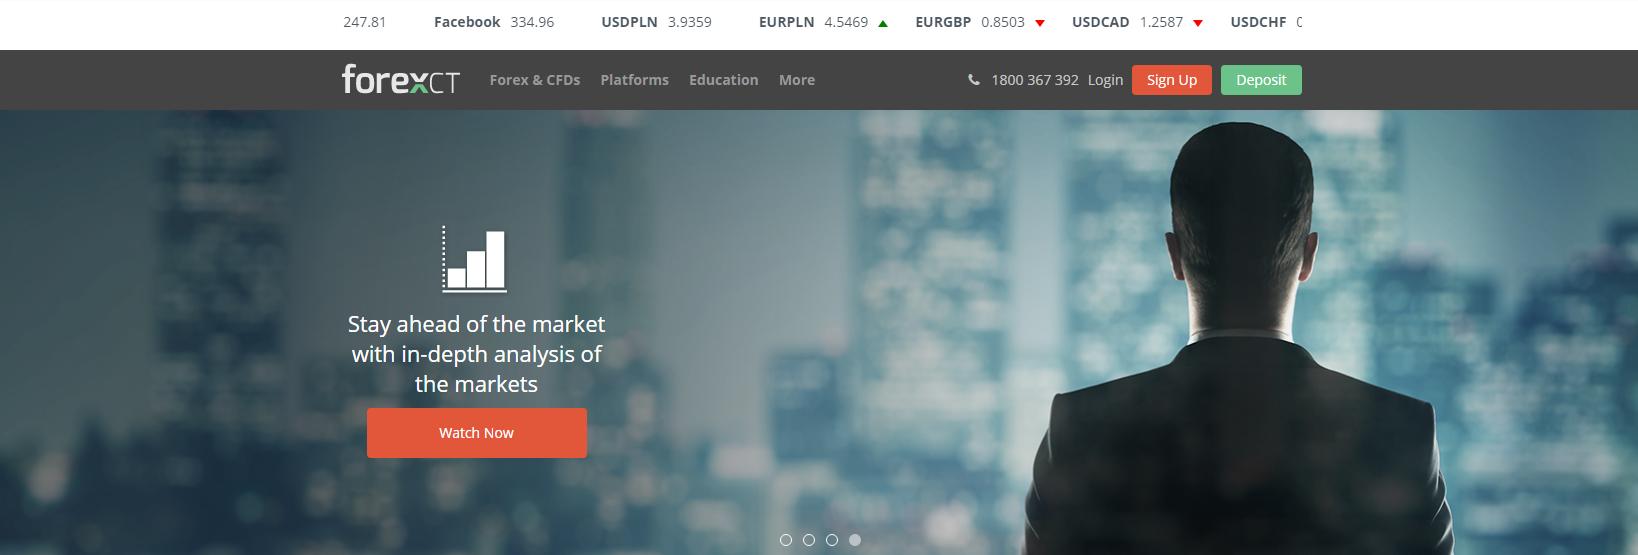 forexct официальный сайт